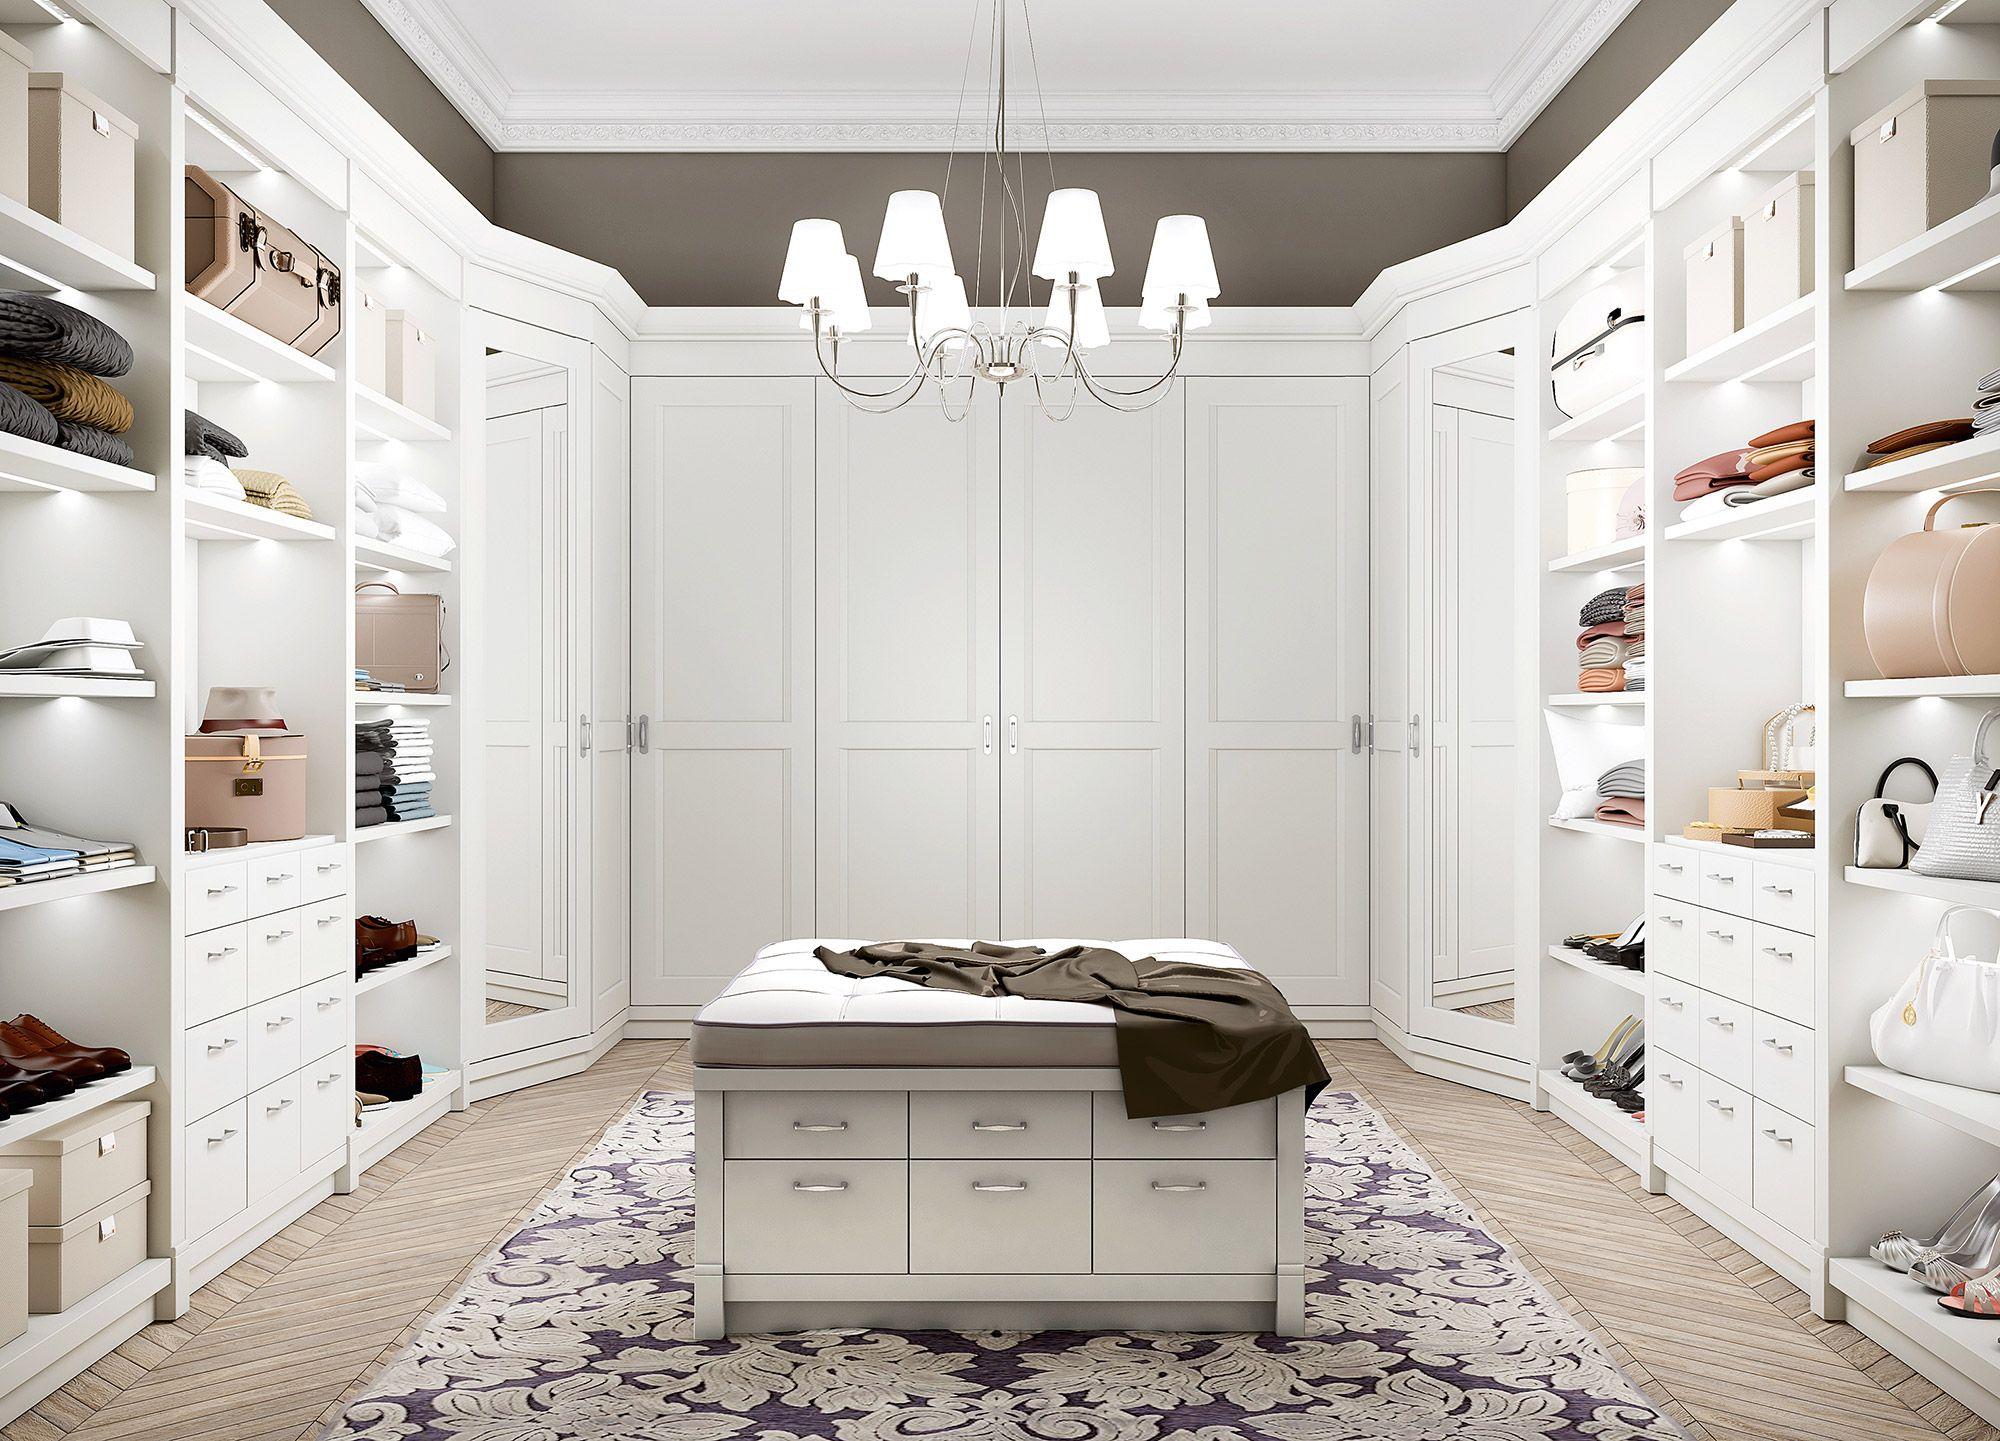 English Mood bedroom by Minacciolo 2016 #minacciolo #englishmood ...